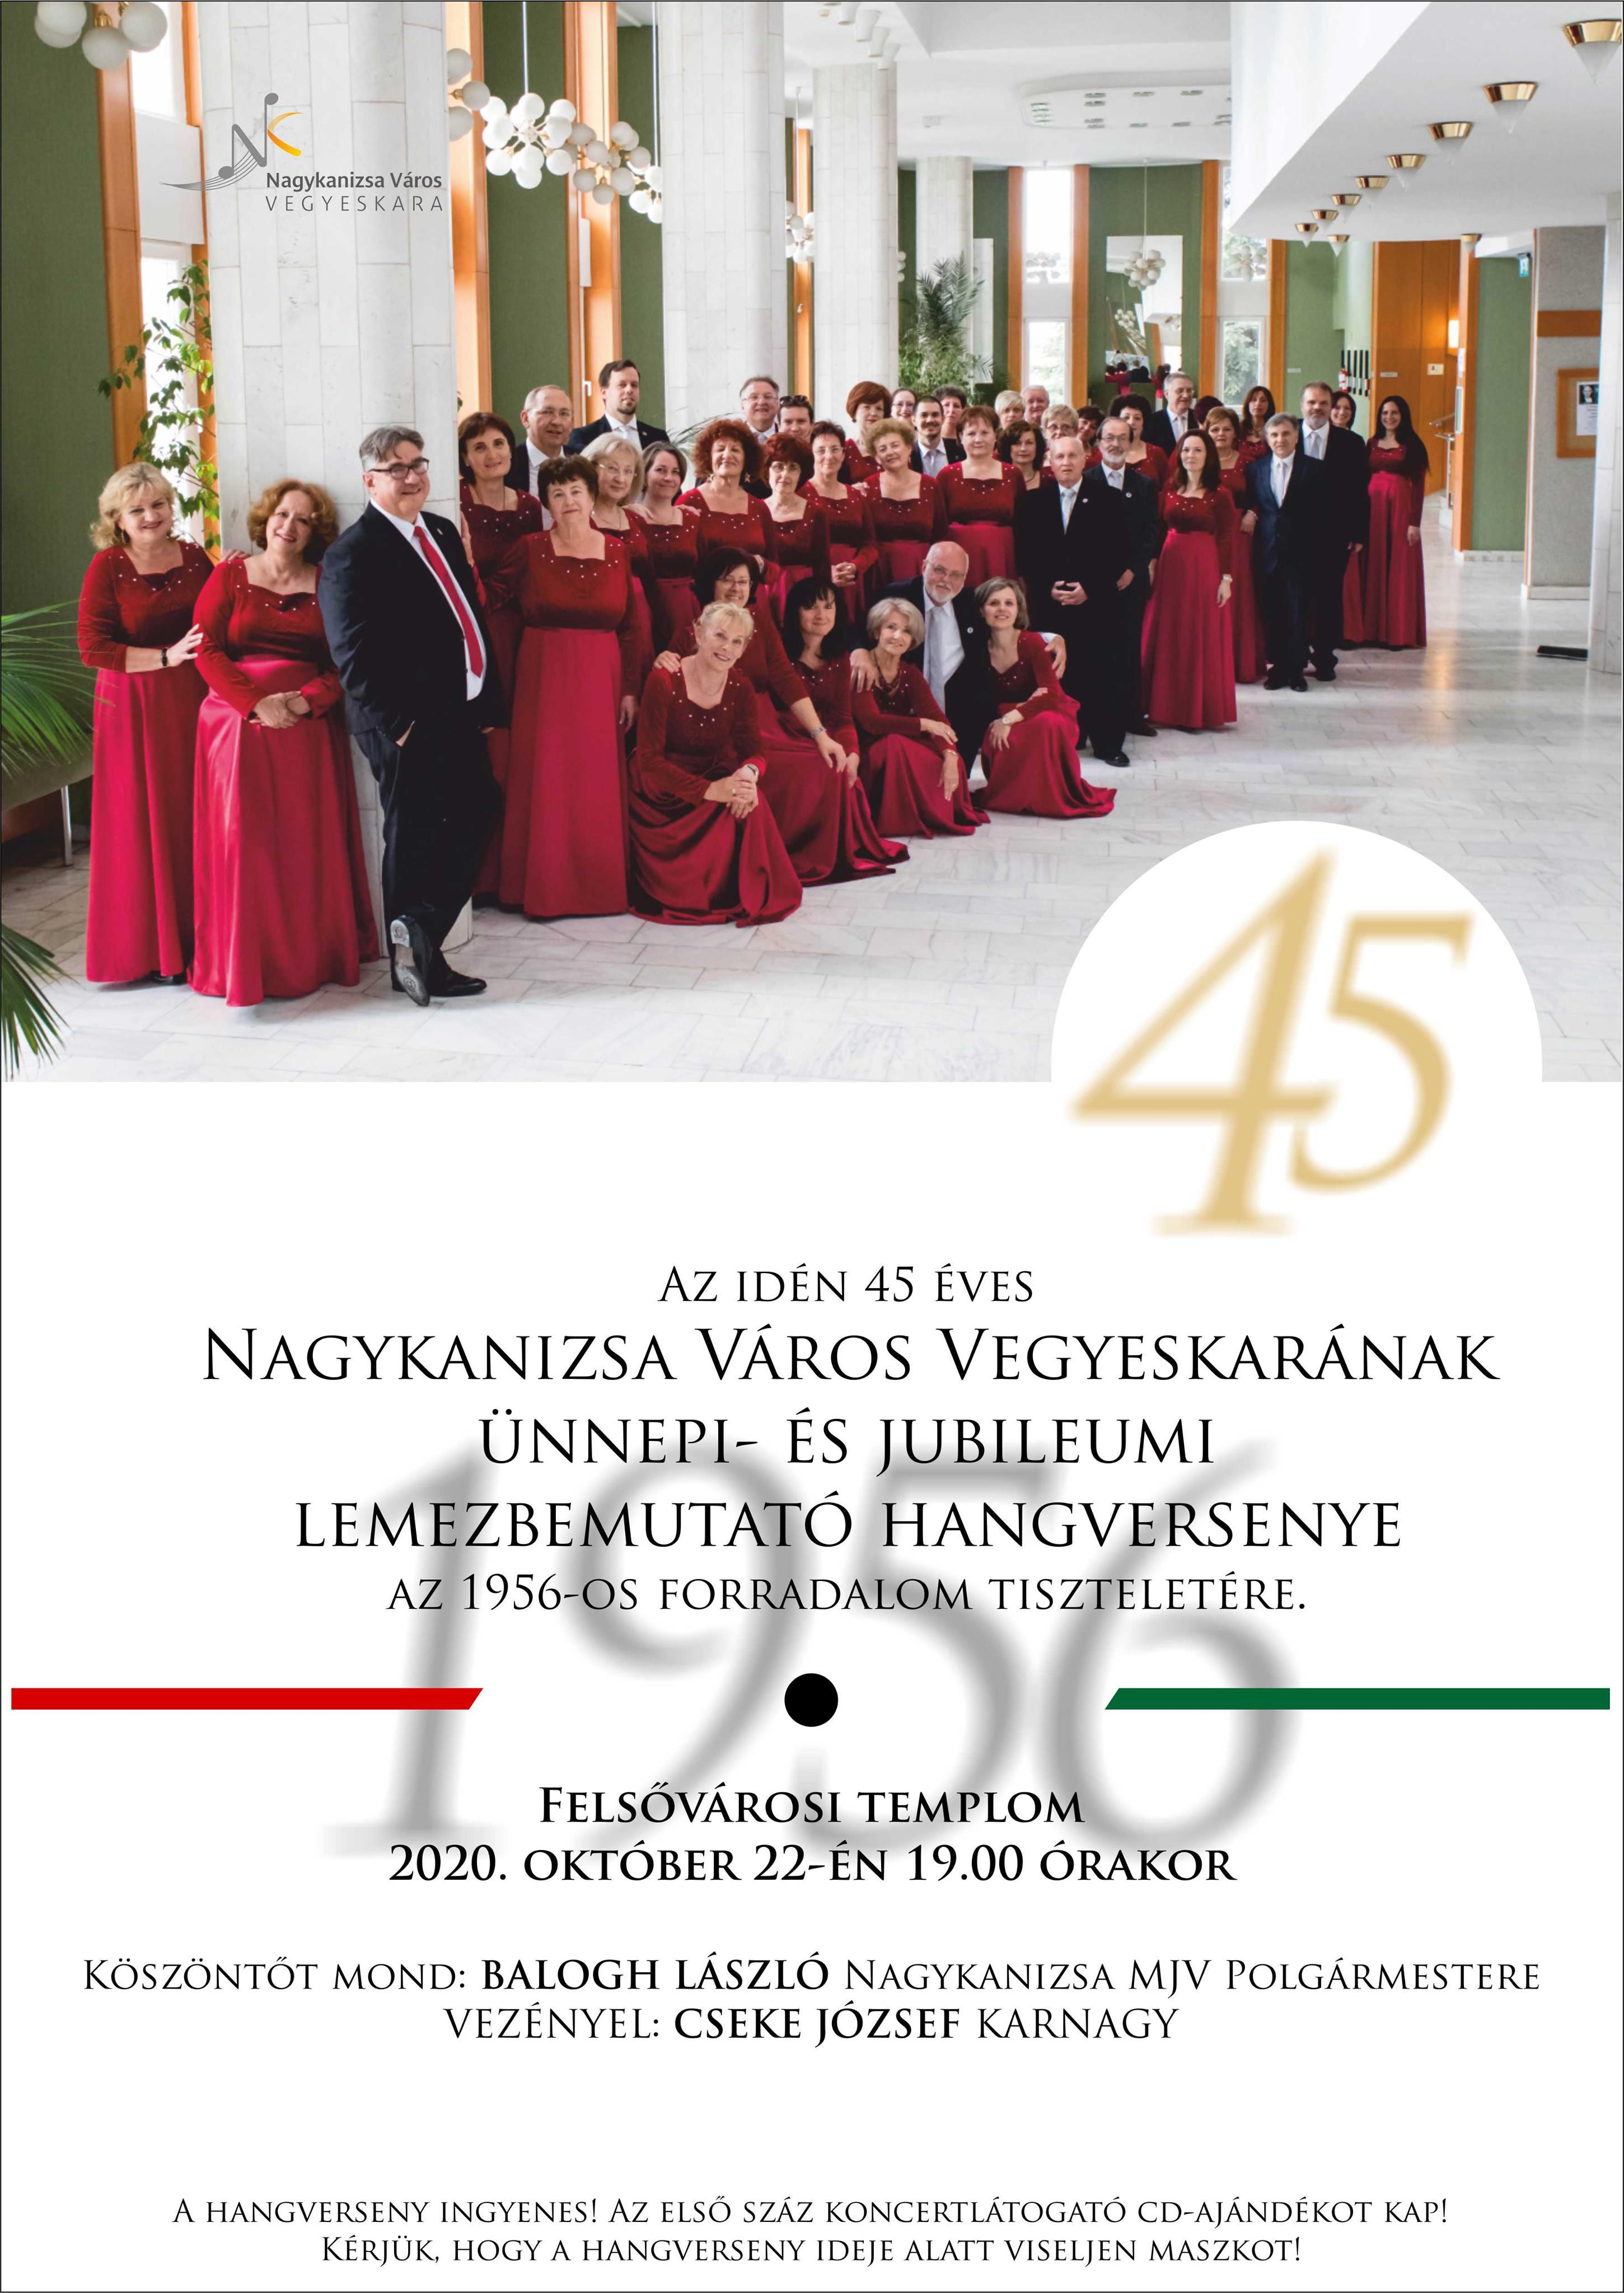 268_121_1022_vegyeskar_koncert.jpg (2901×4096)